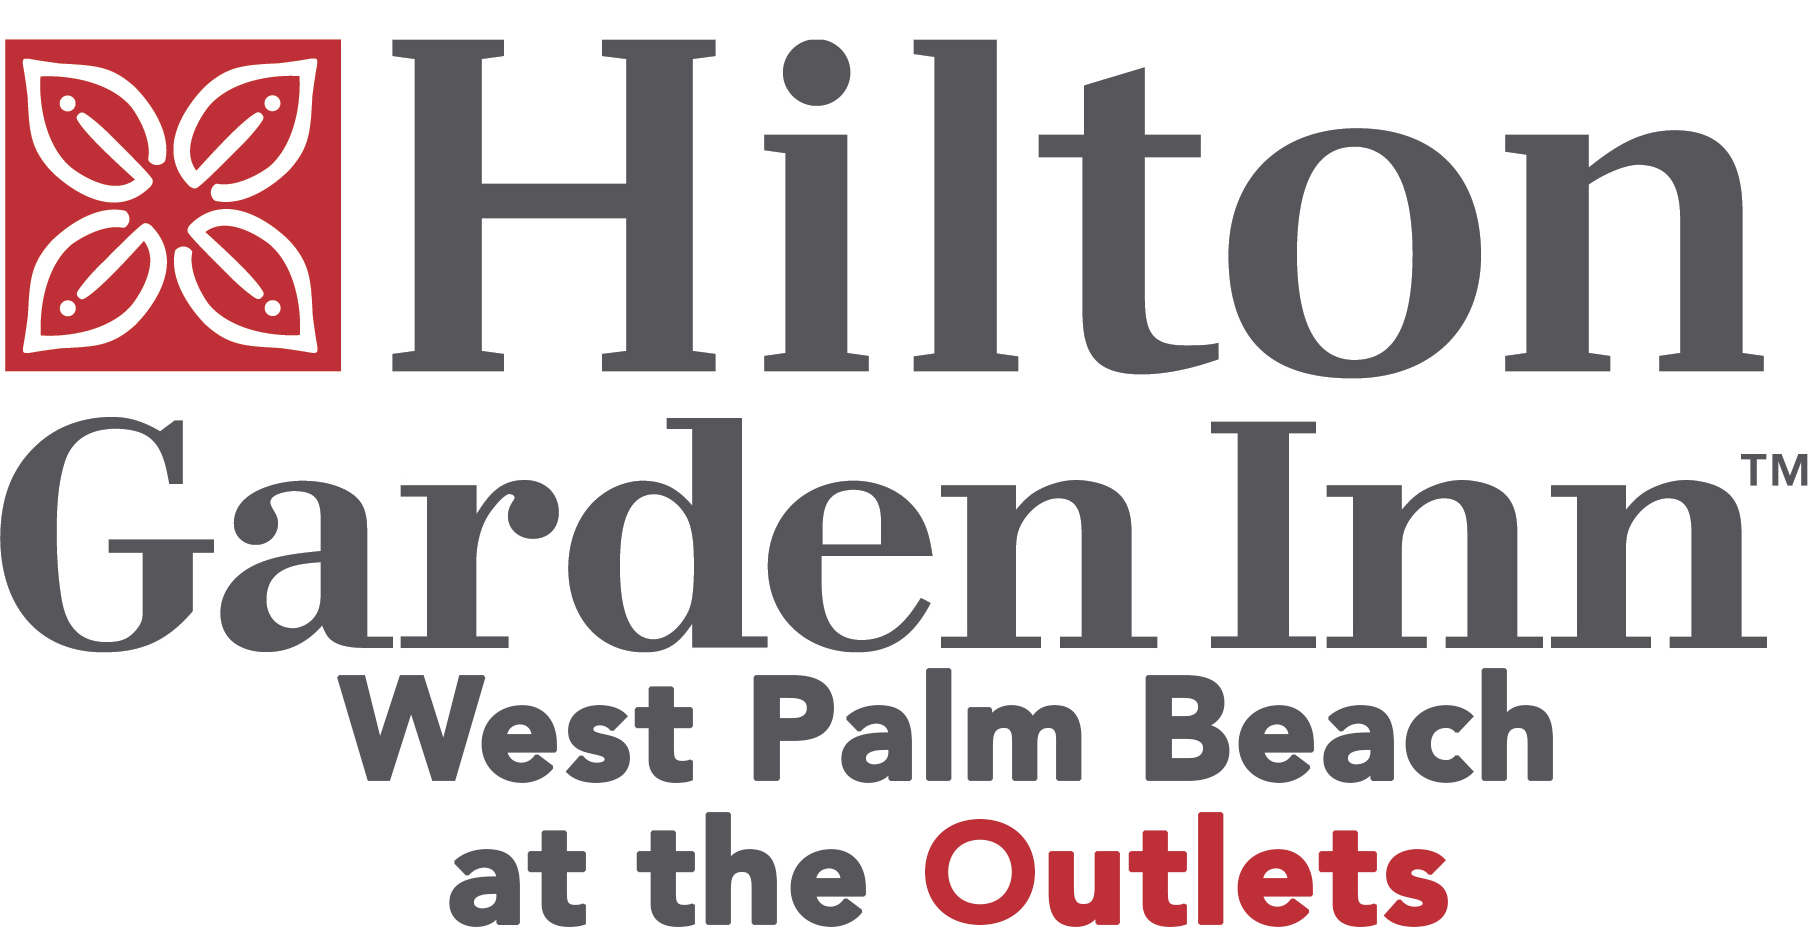 Hilton logo outlets.png